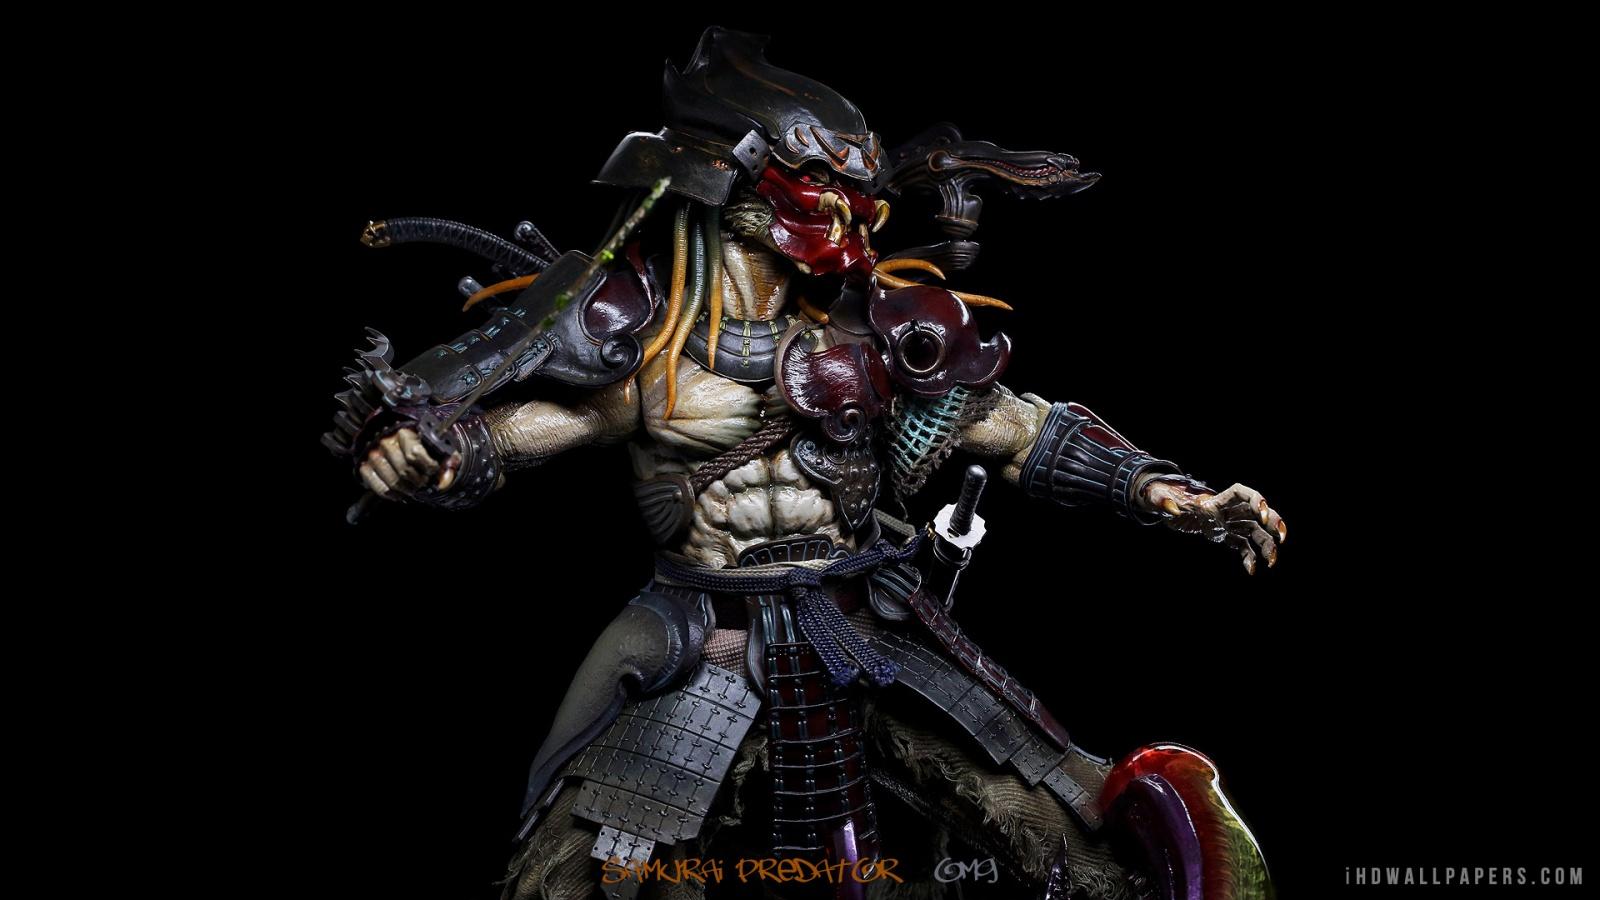 Samurai Predator HD Wallpaper   iHD Wallpapers 1600x900